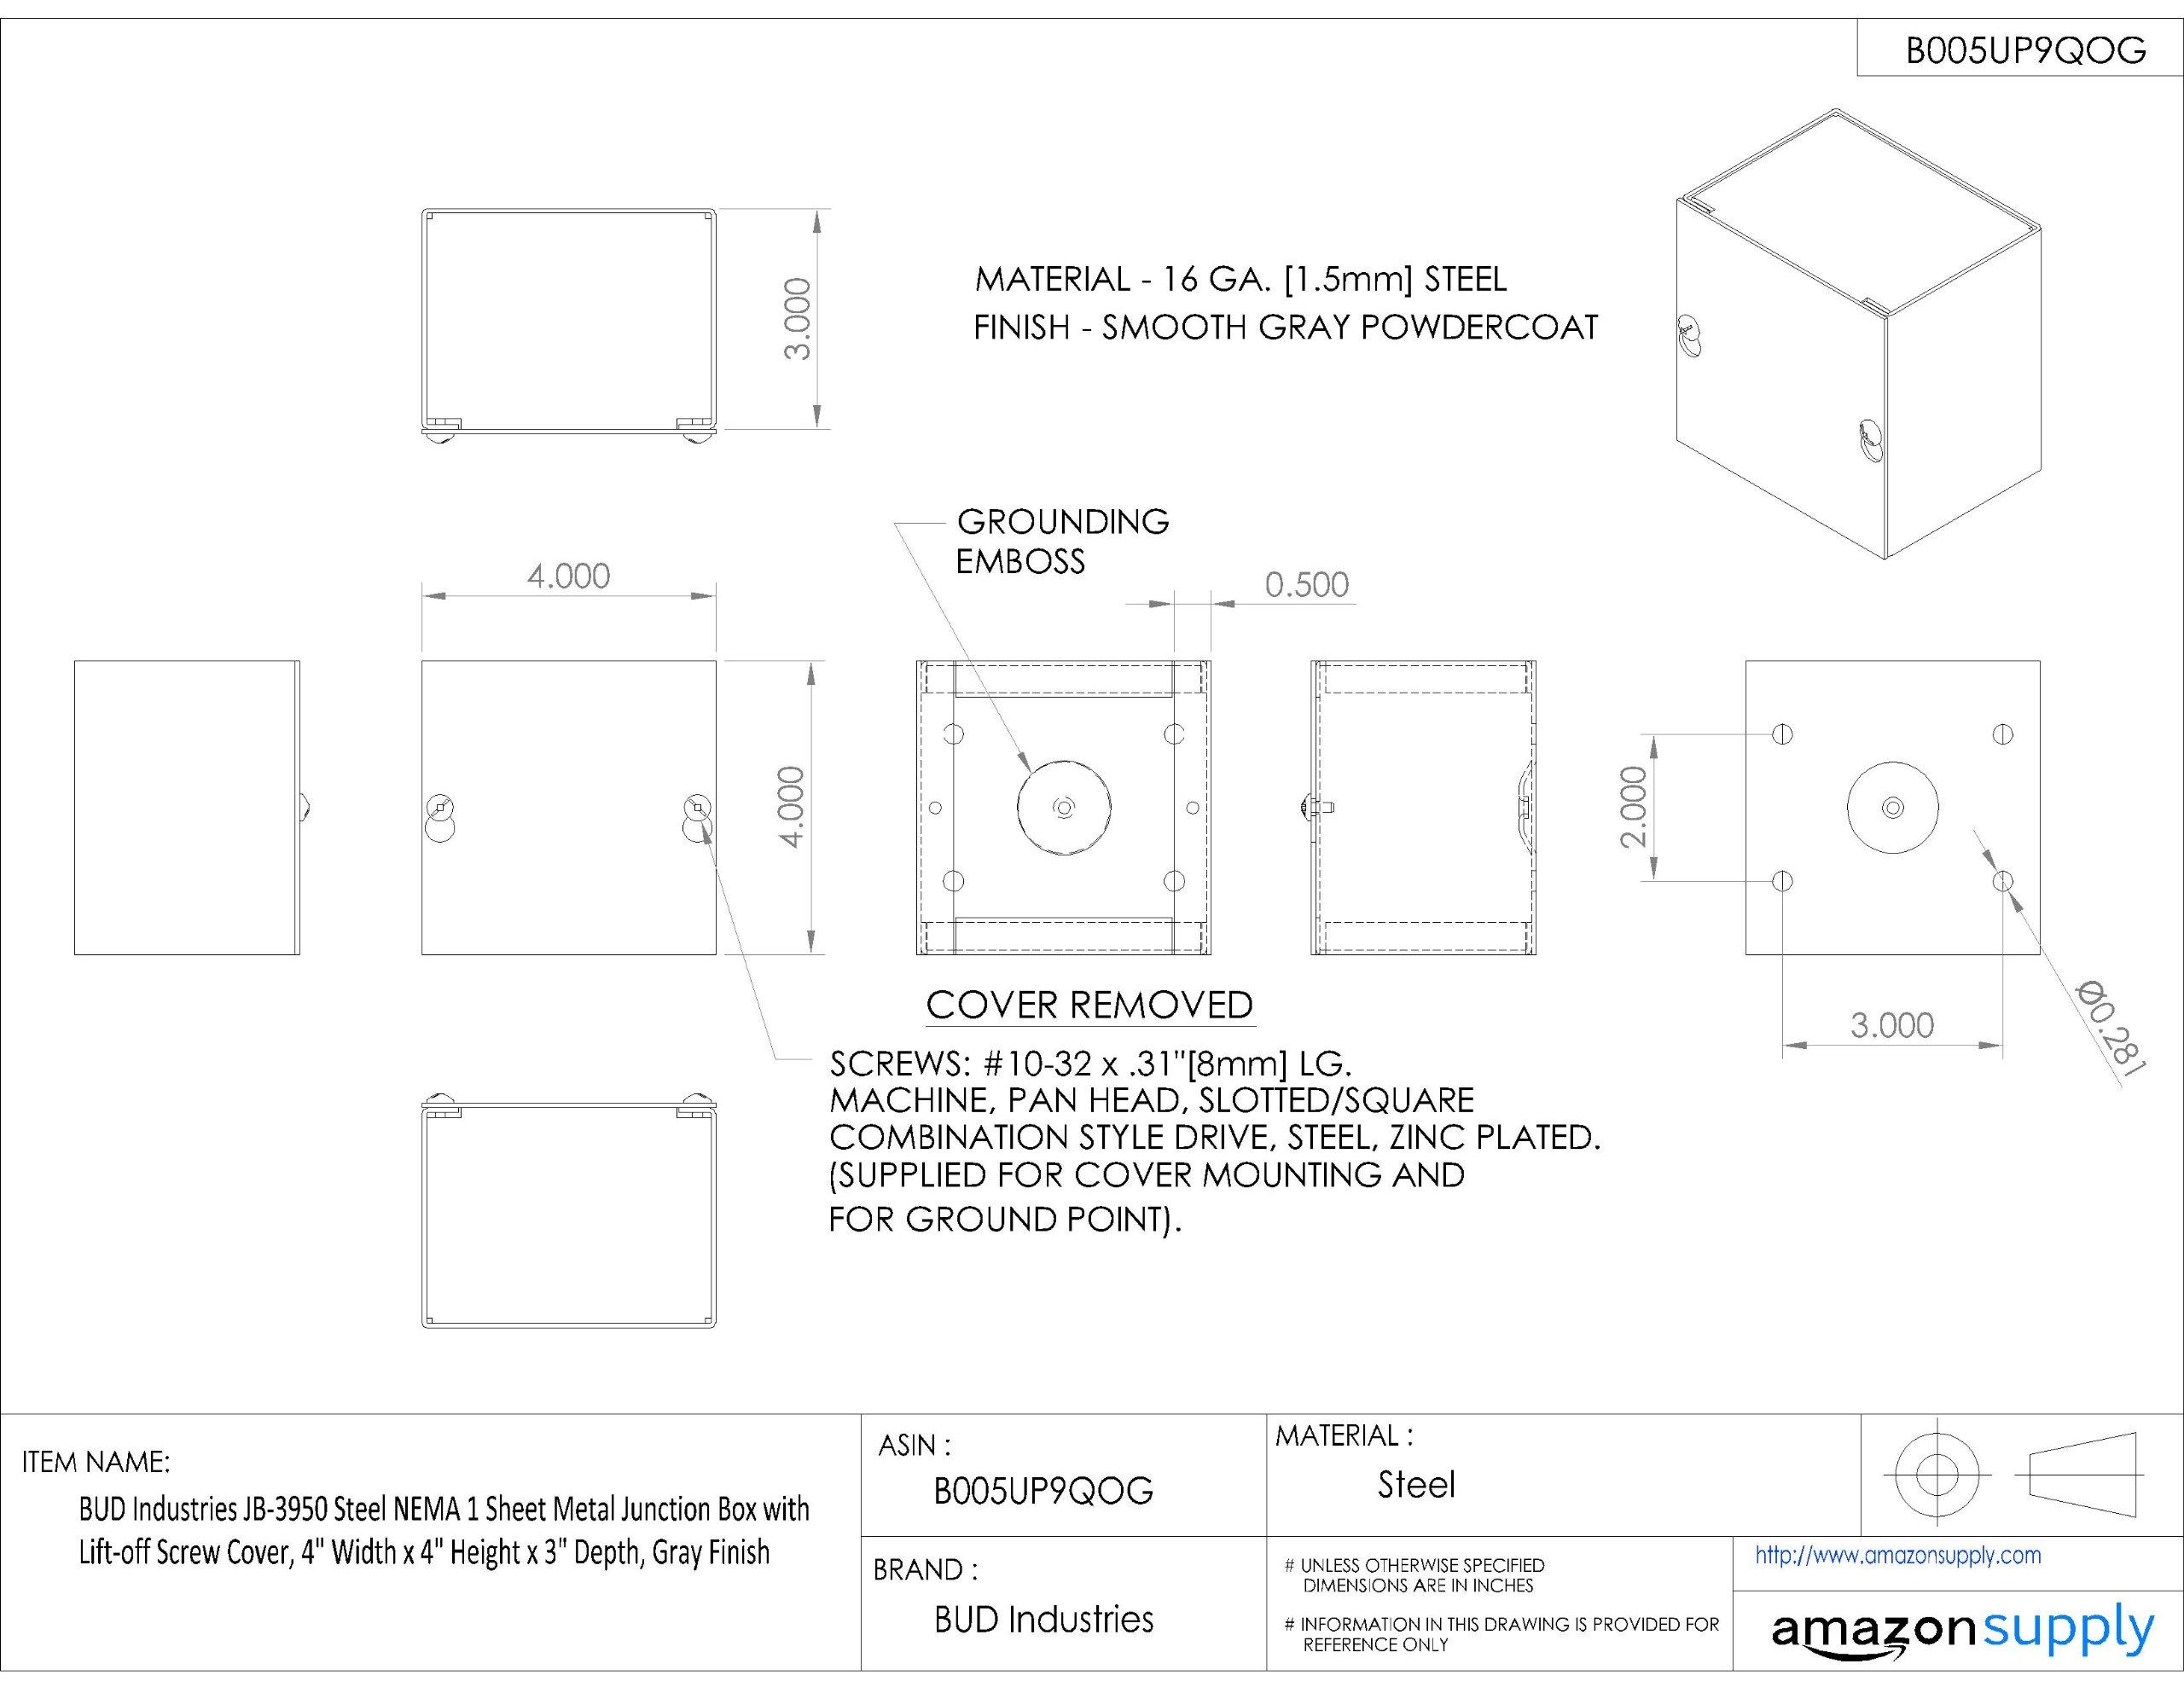 BUD Industries JB-3950 Steel NEMA 1 Sheet Metal Junction Box with Lift-off Screw Cover, 4'' Width x 4'' Height x 3'' Depth, Gray Finish